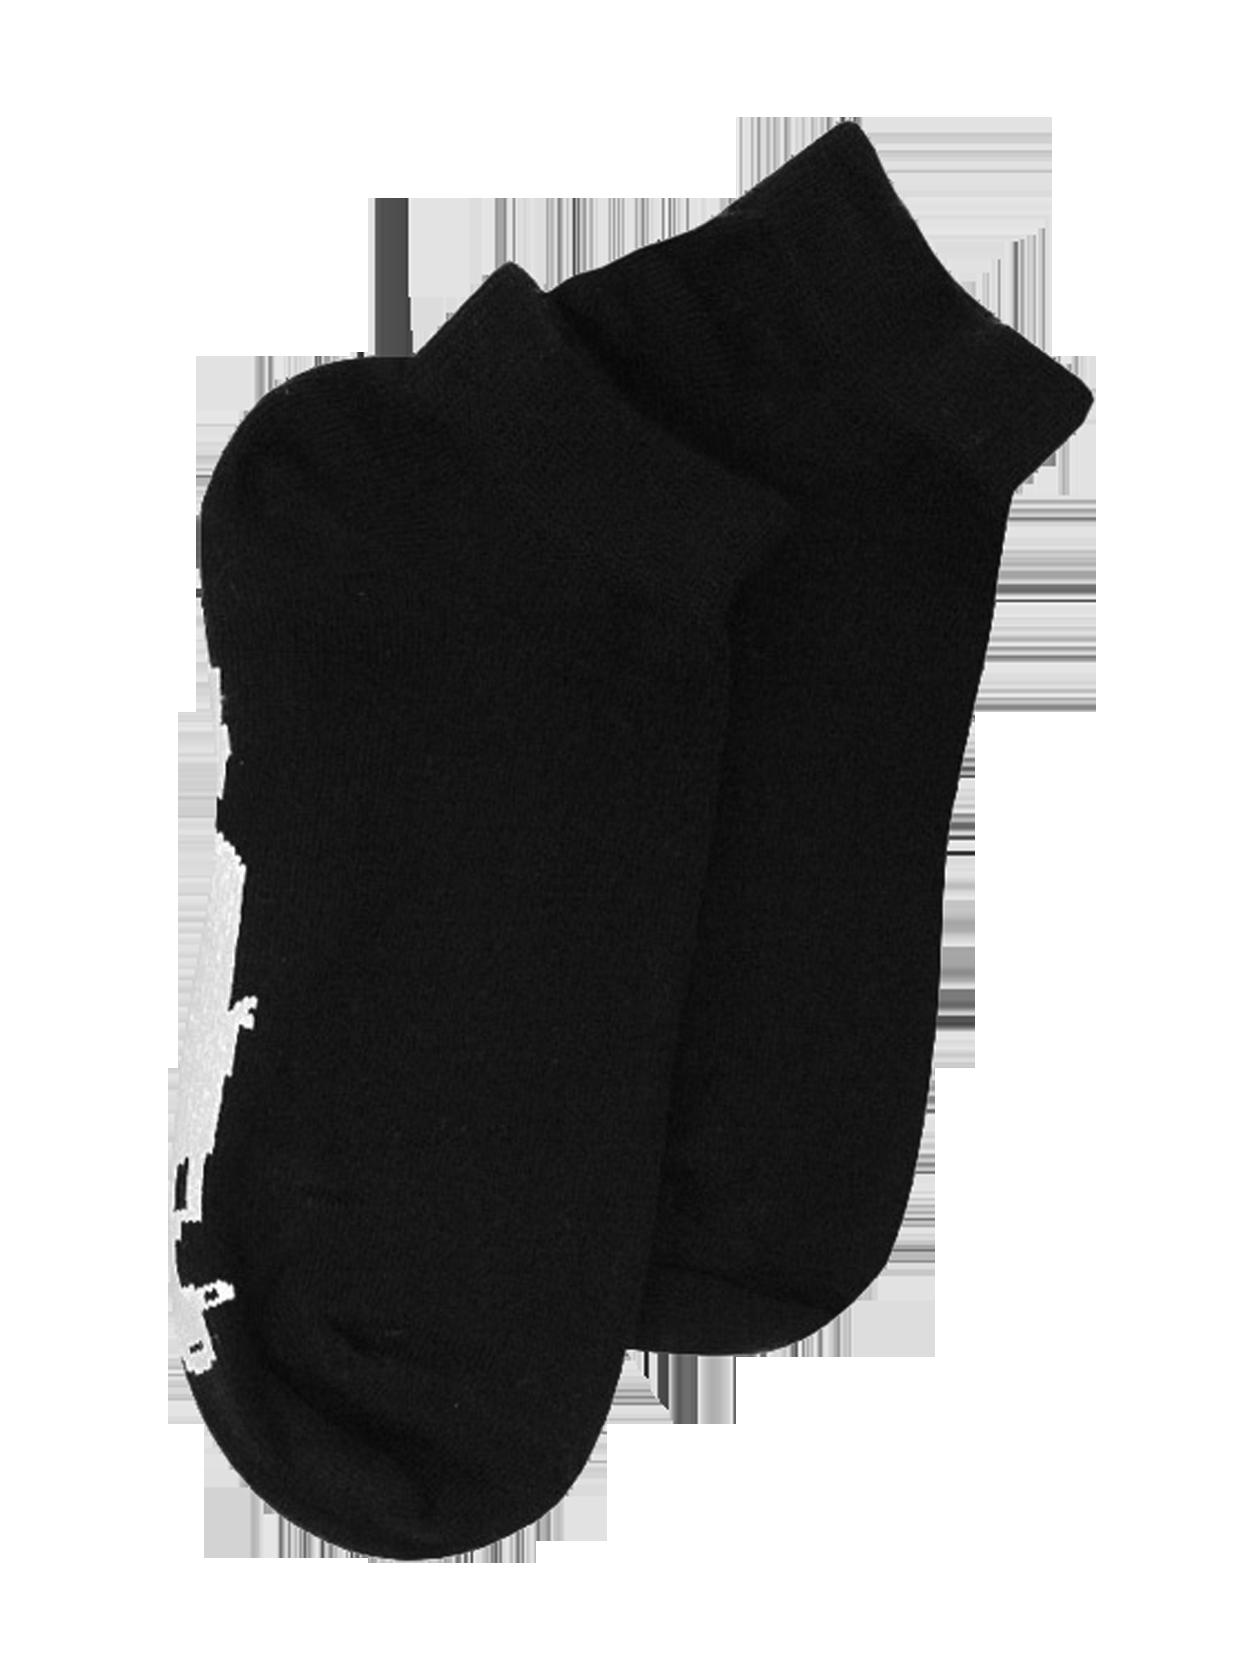 Unisex Socks RIFLE middle